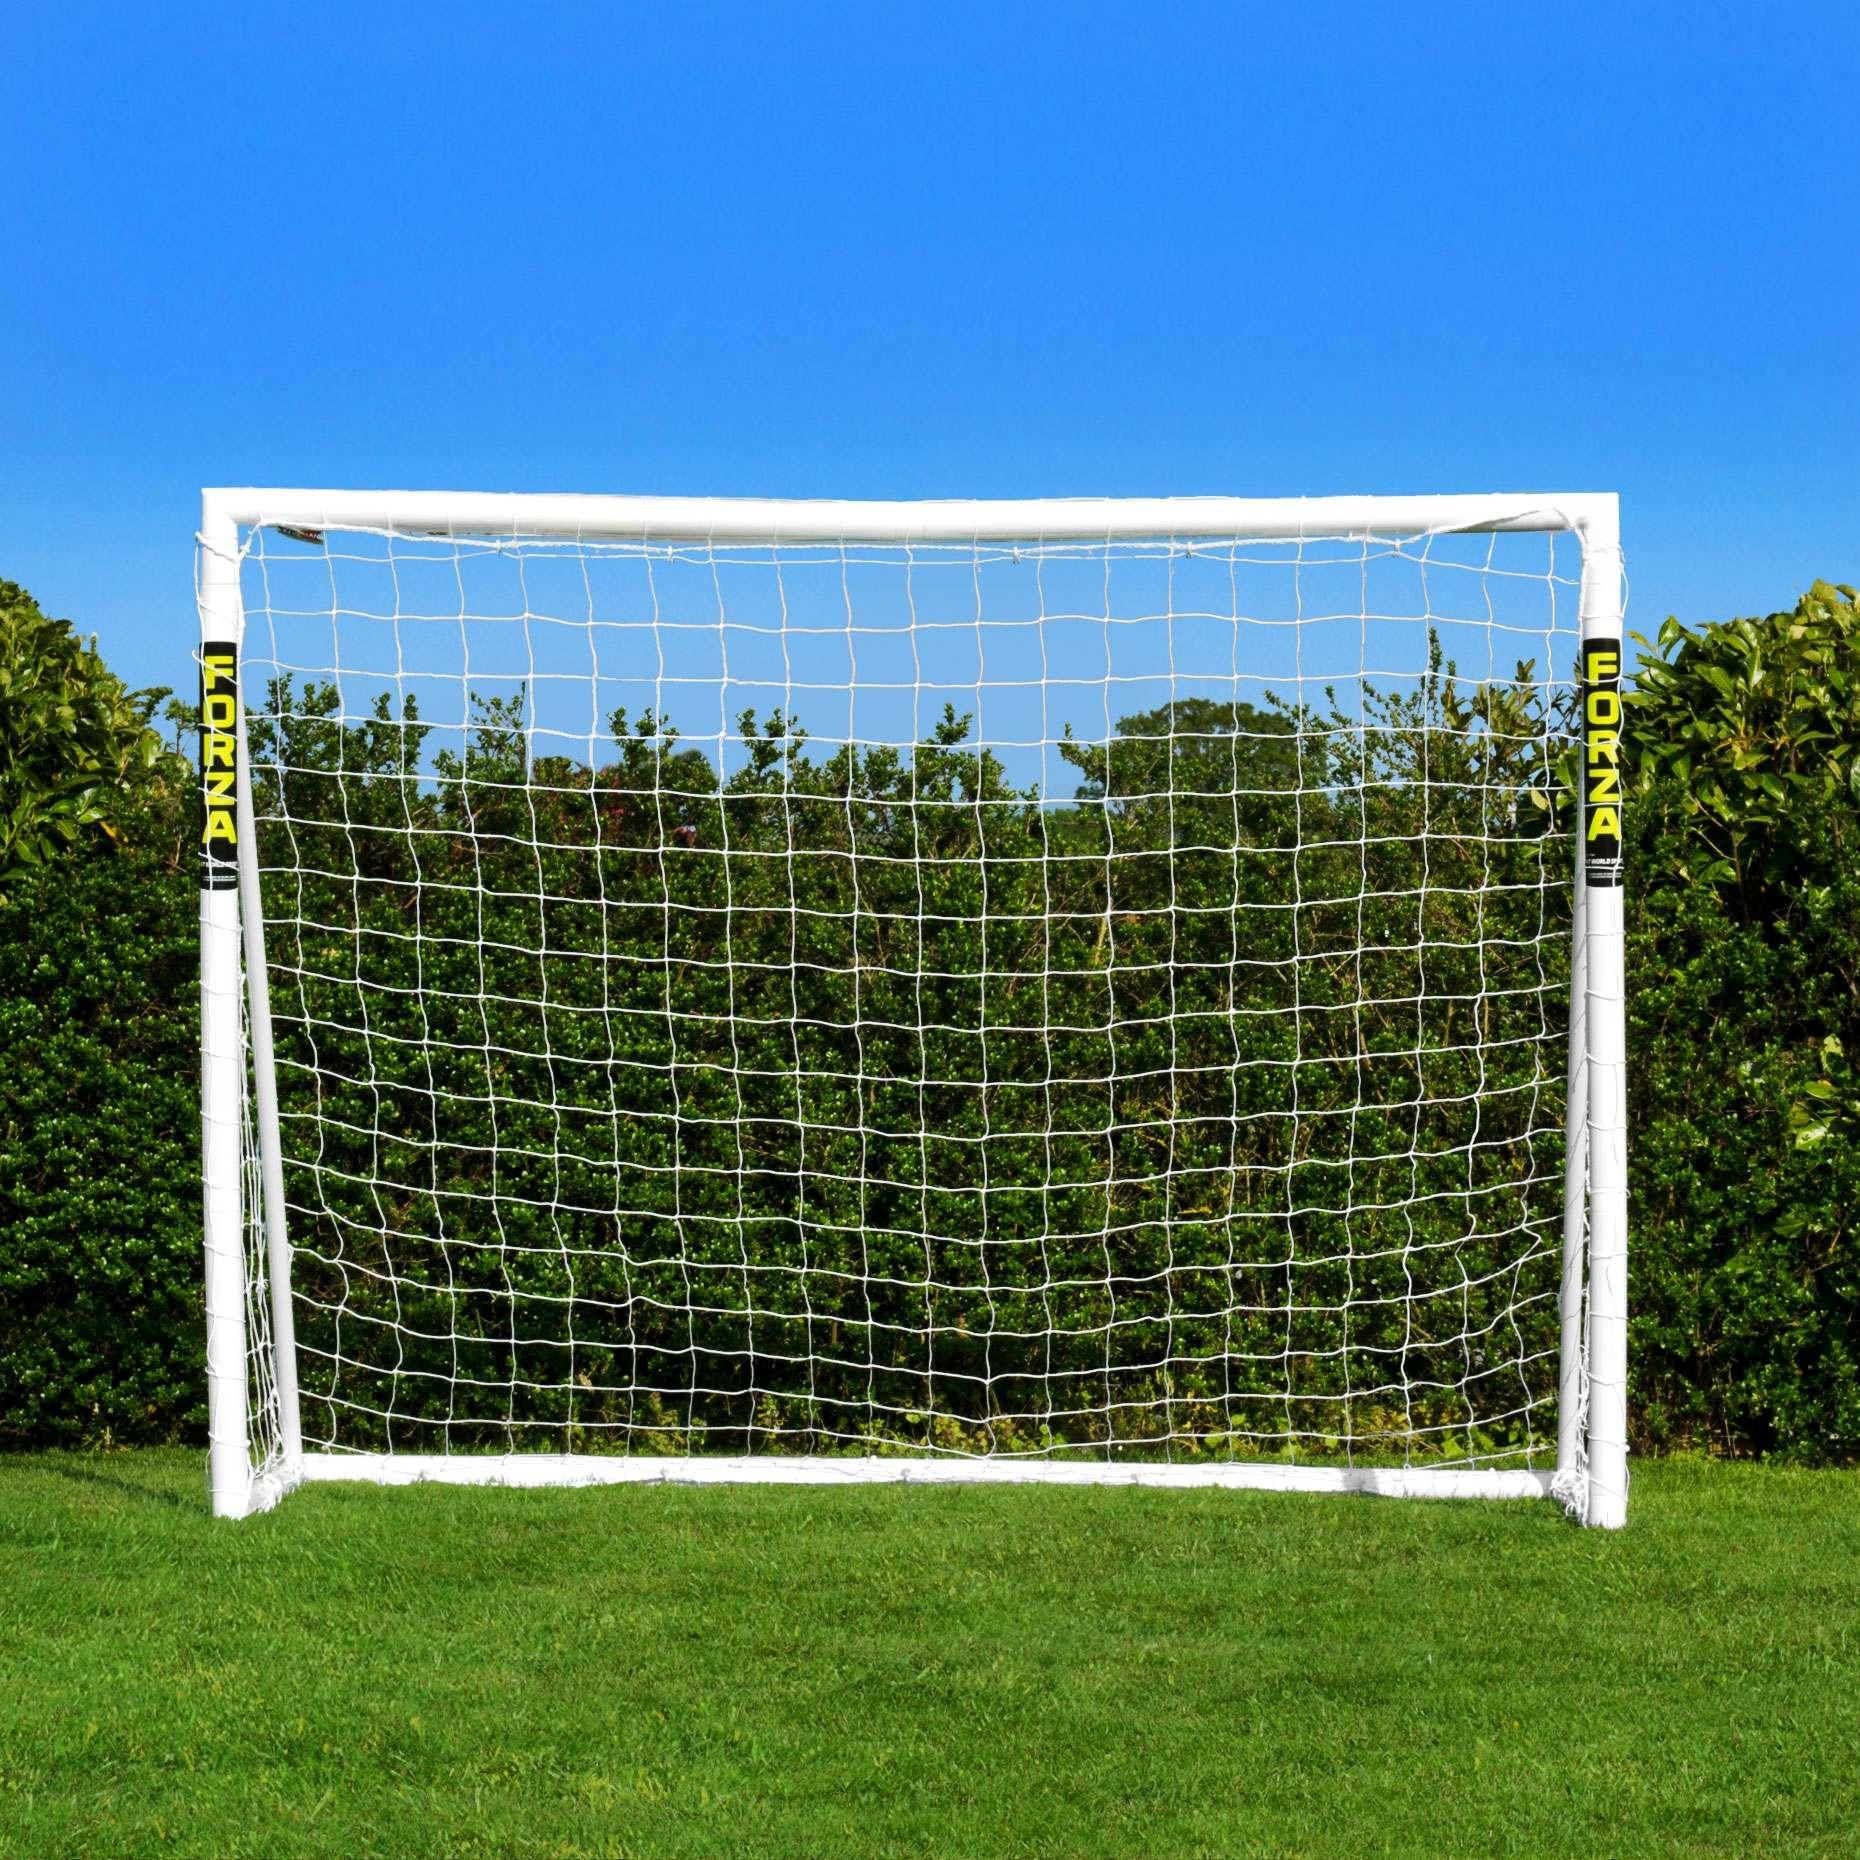 8 x 6 FORZA Soccer Goal Post